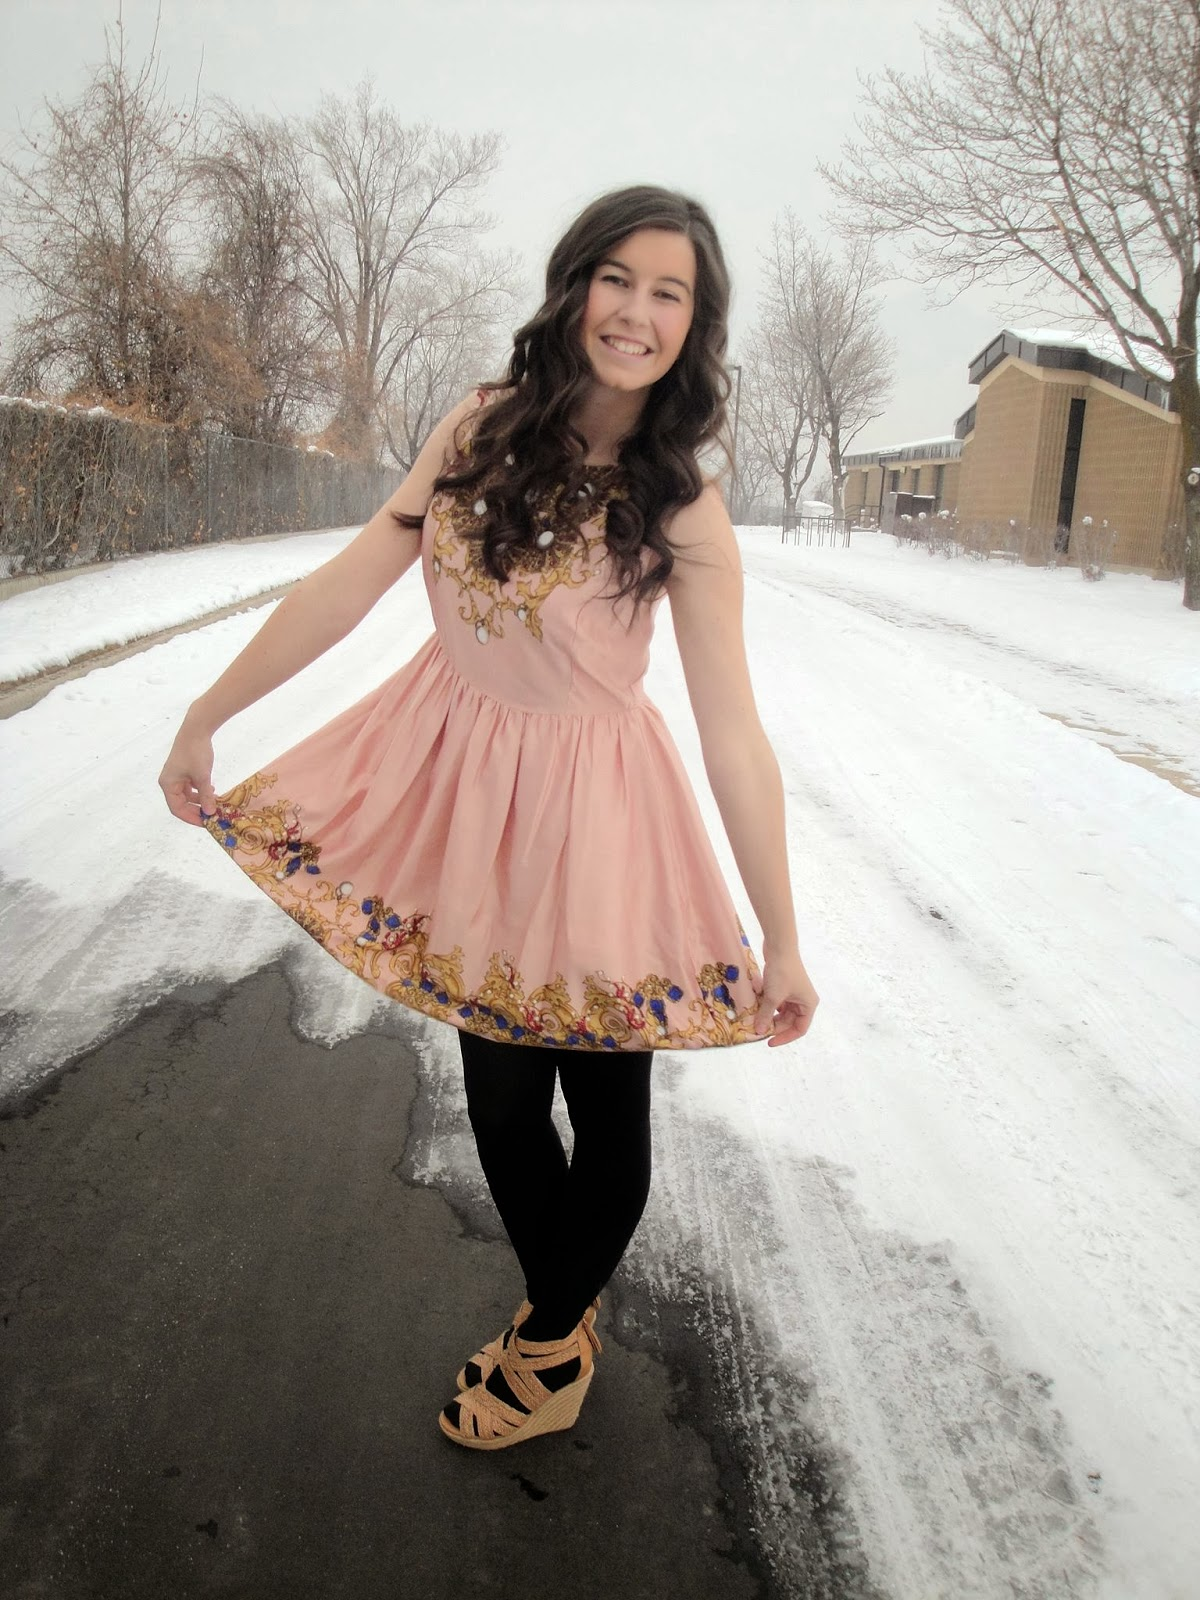 Jcpenneys jcp dress joe fresh dress christmas dress christmas